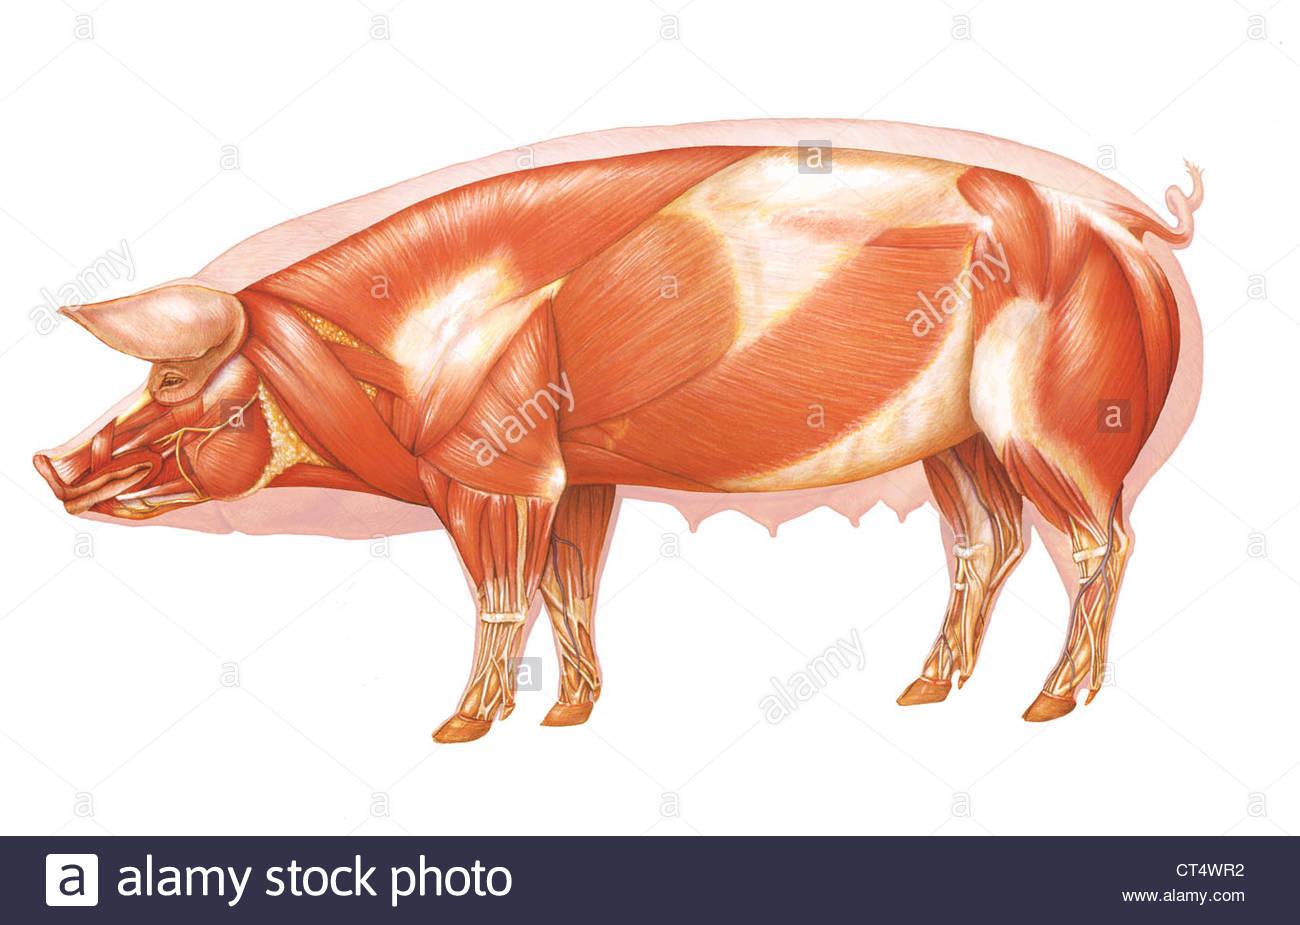 Pig Anatomy Stockfotos & Pig Anatomy Bilder - Alamy